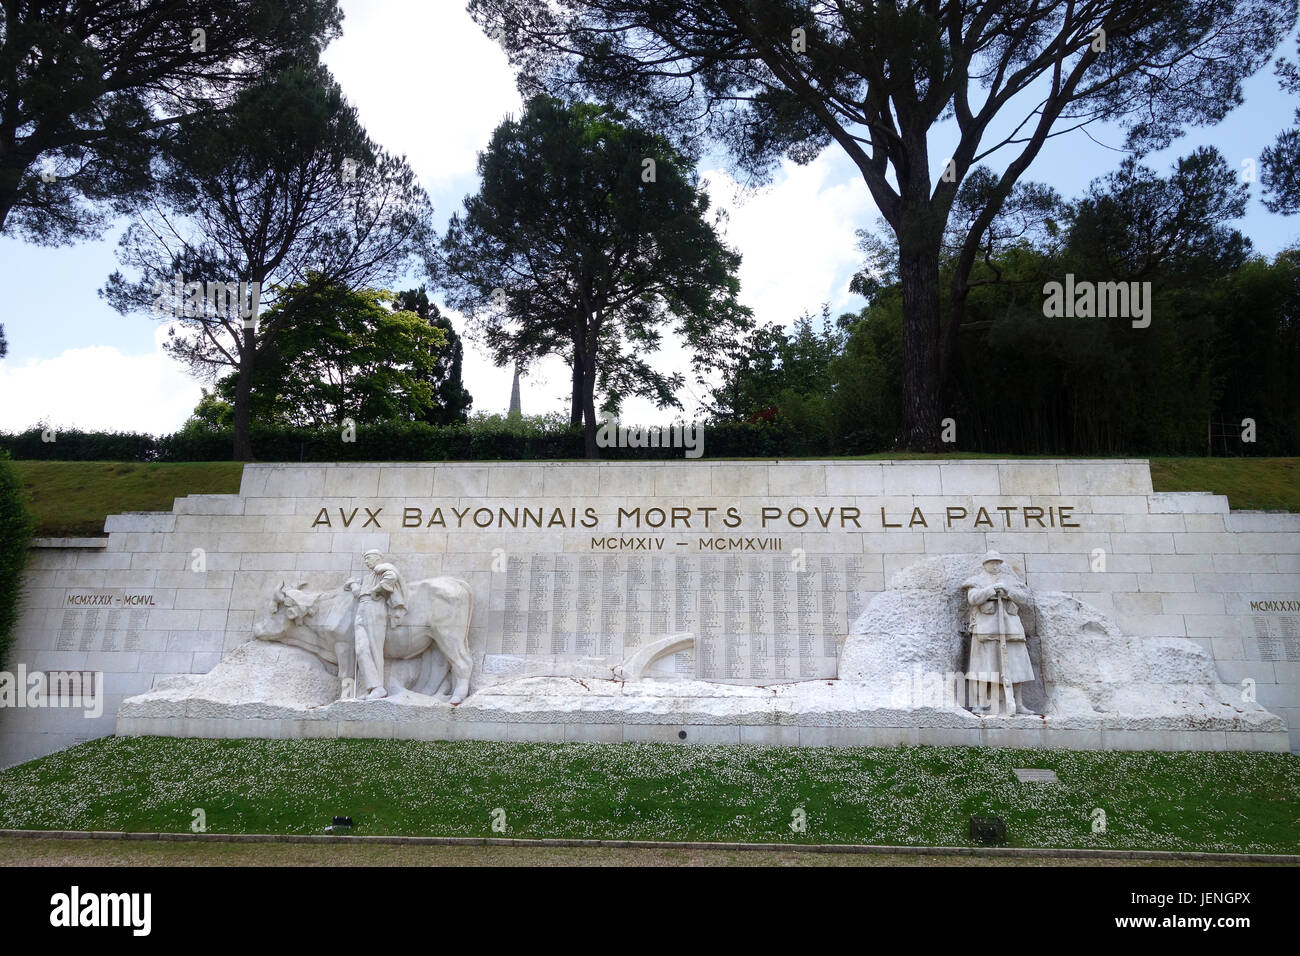 War memorial at Bayonne in France - Stock Image